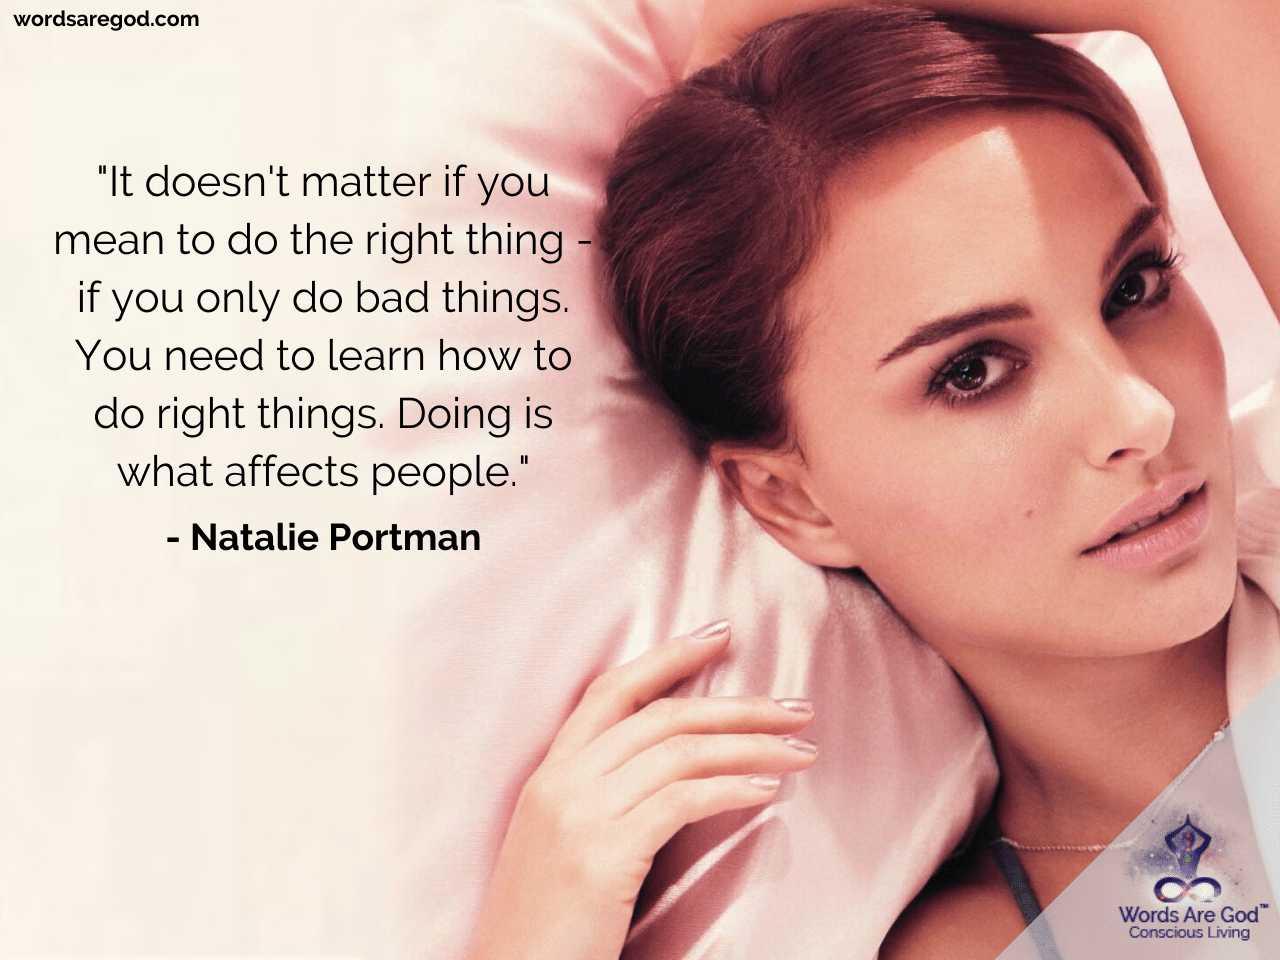 Natalie Portman Inspirational Quotes by Natalie Portman